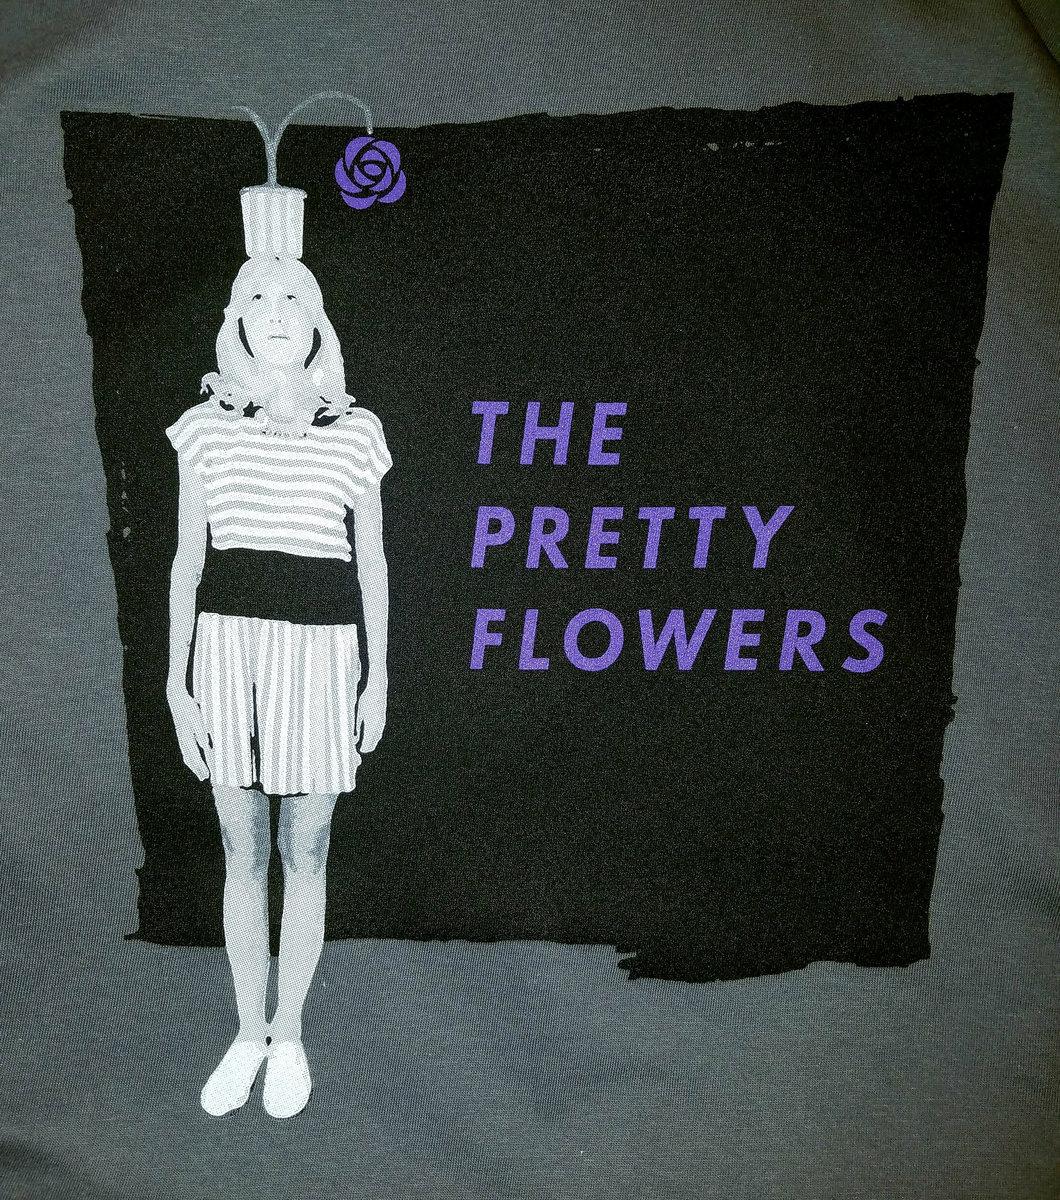 The Pretty Flowers Flower Pot Girl Shirt The Pretty Flowers